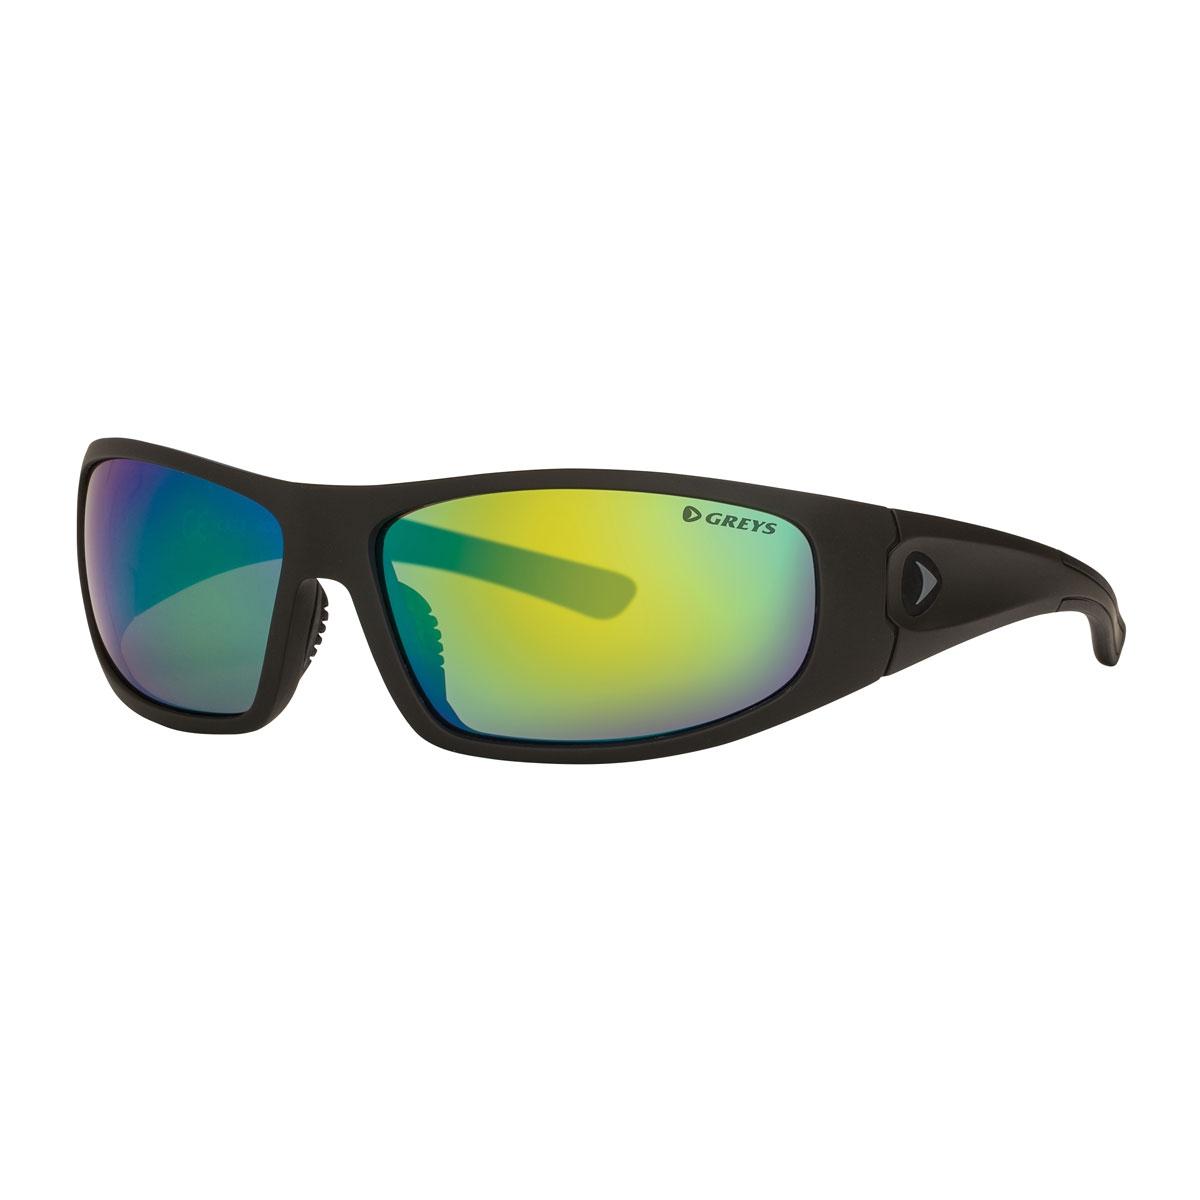 a38a212b28 Image of Greys G1 Sunglasses - Matt Carbon Frame Green Mirror Lens ...